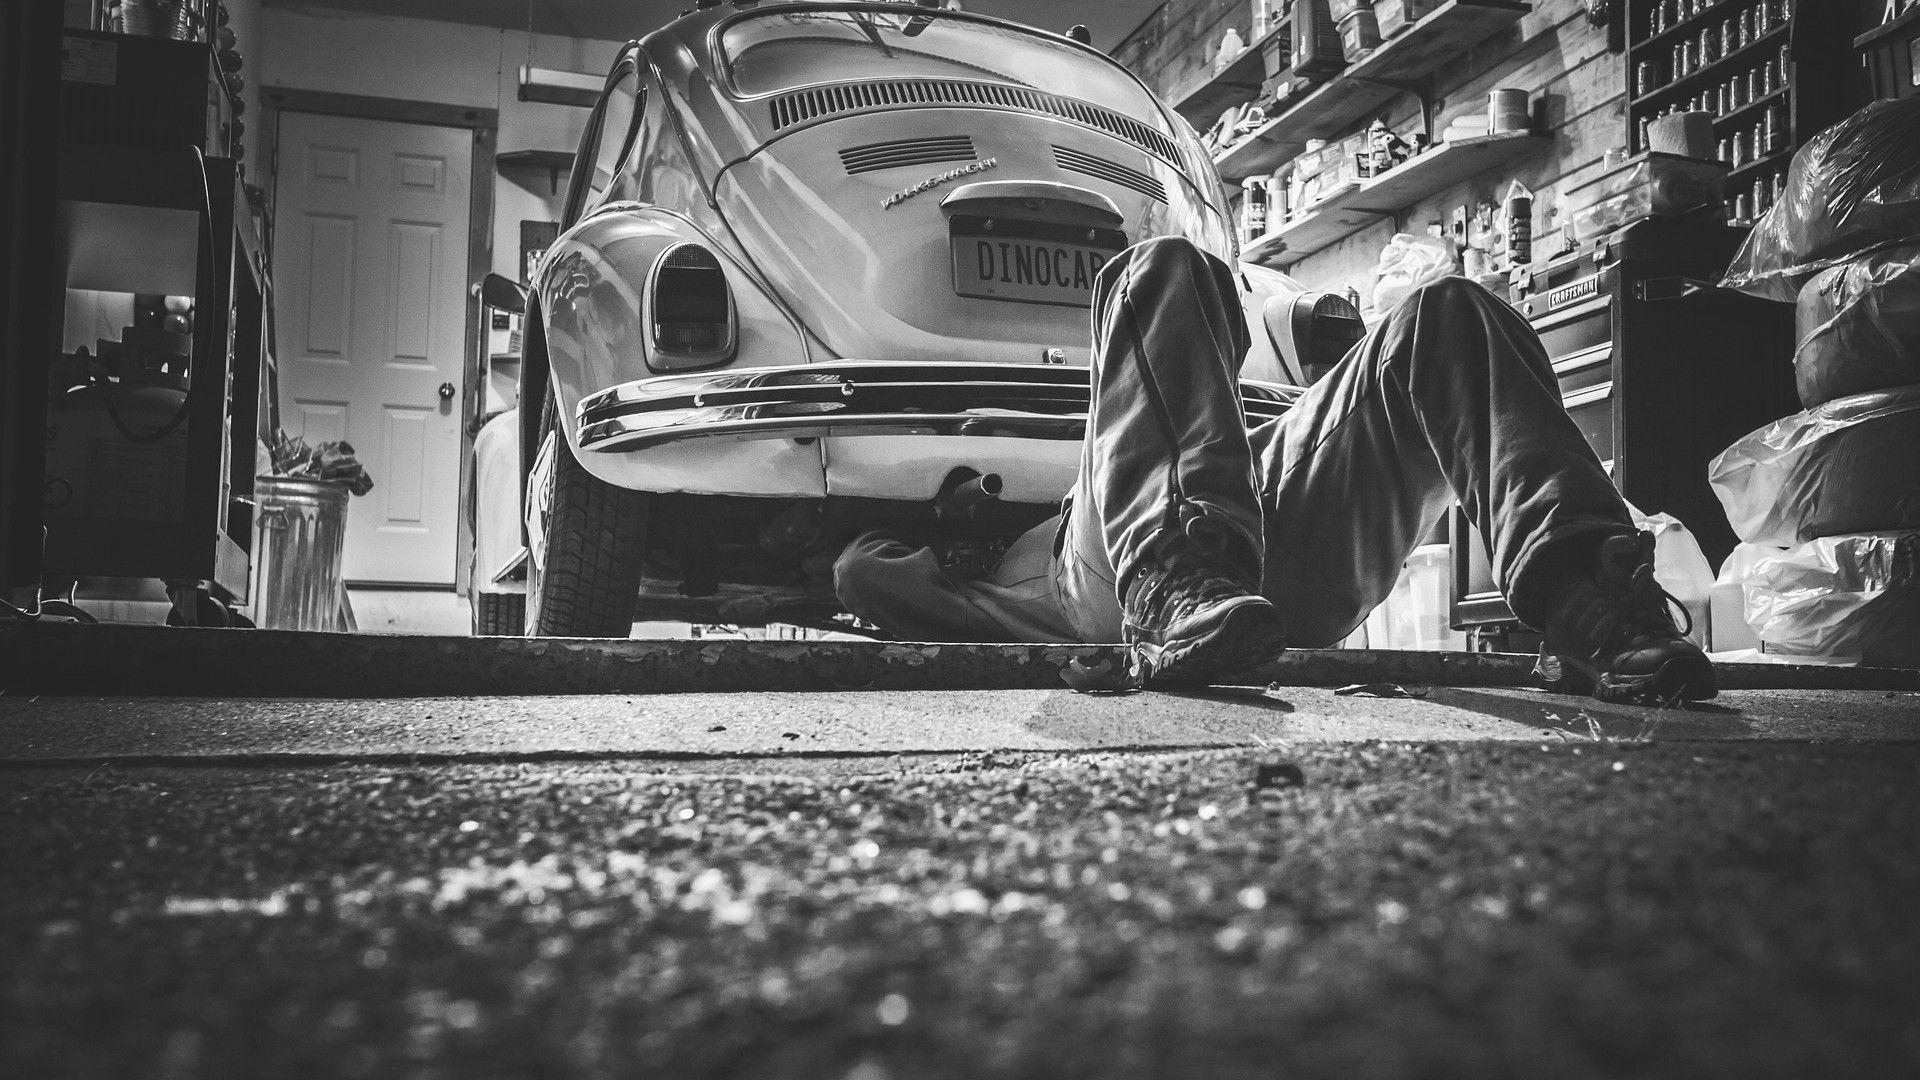 Mechanic Shop Wallpaper Google Search Auto Reparacao Manutencao Do Carro Automotivo